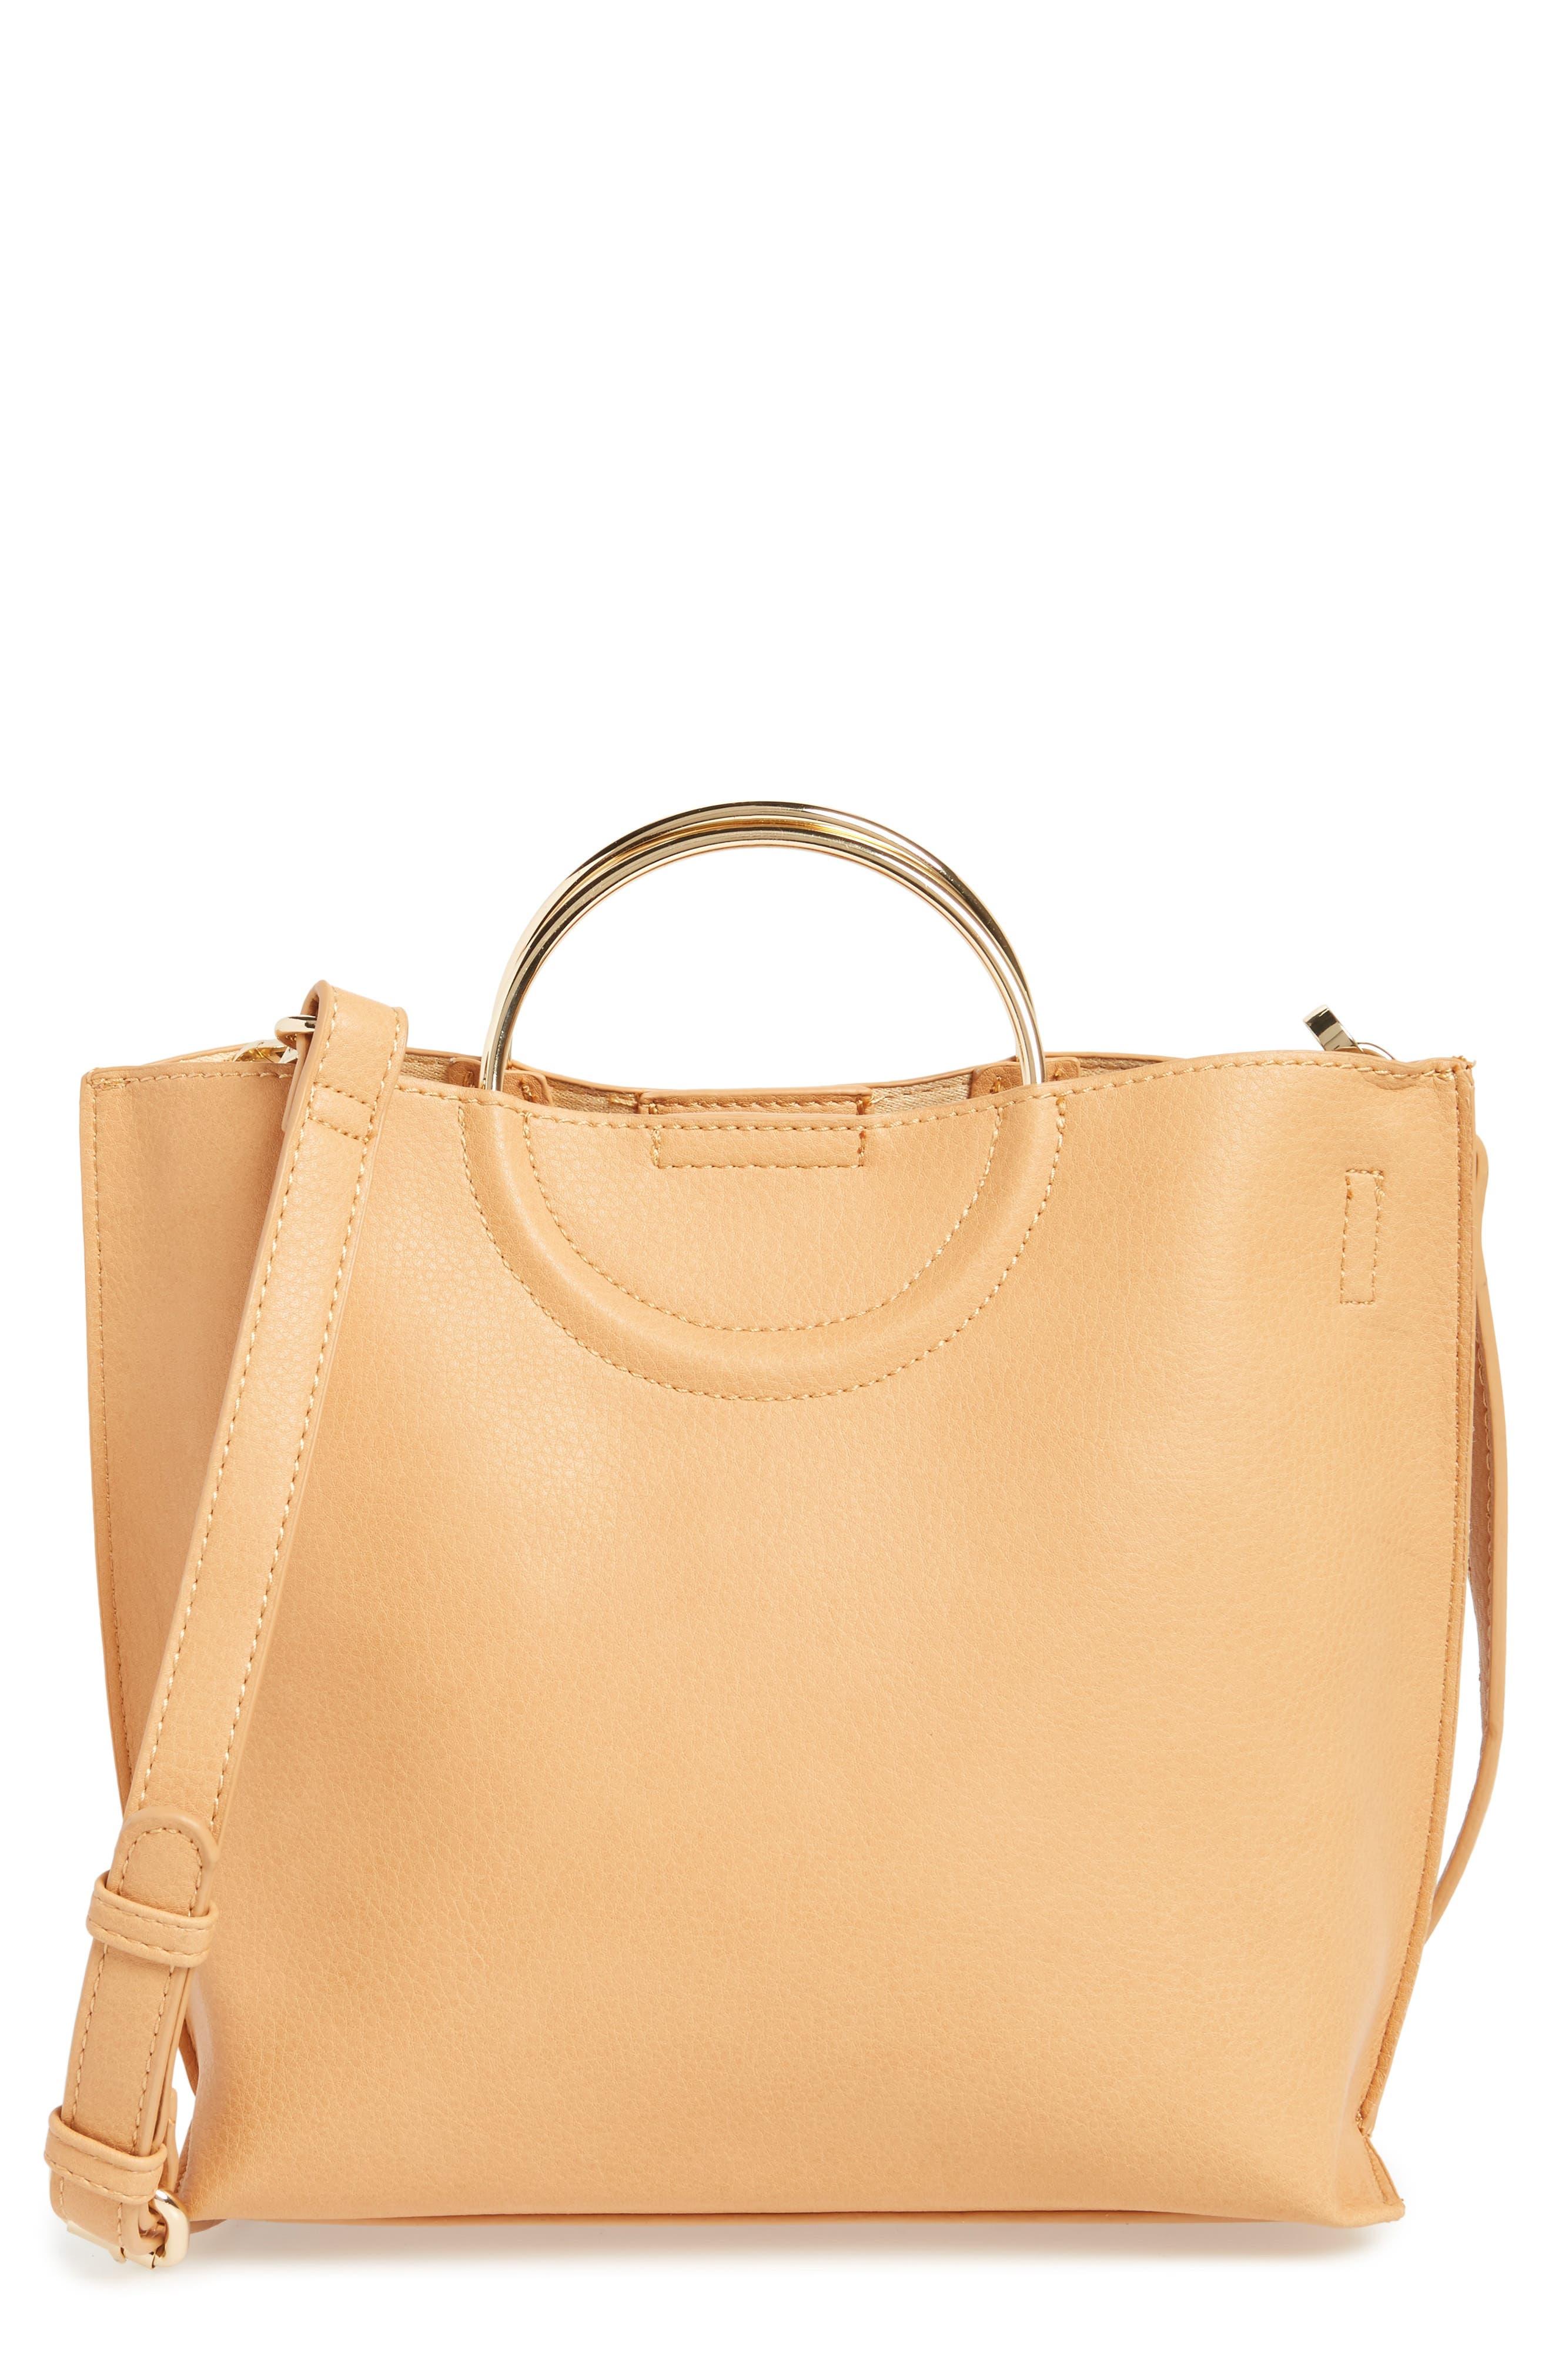 Alternate Image 1 Selected - BP. Metal Handle Faux Leather Crossbody Bag